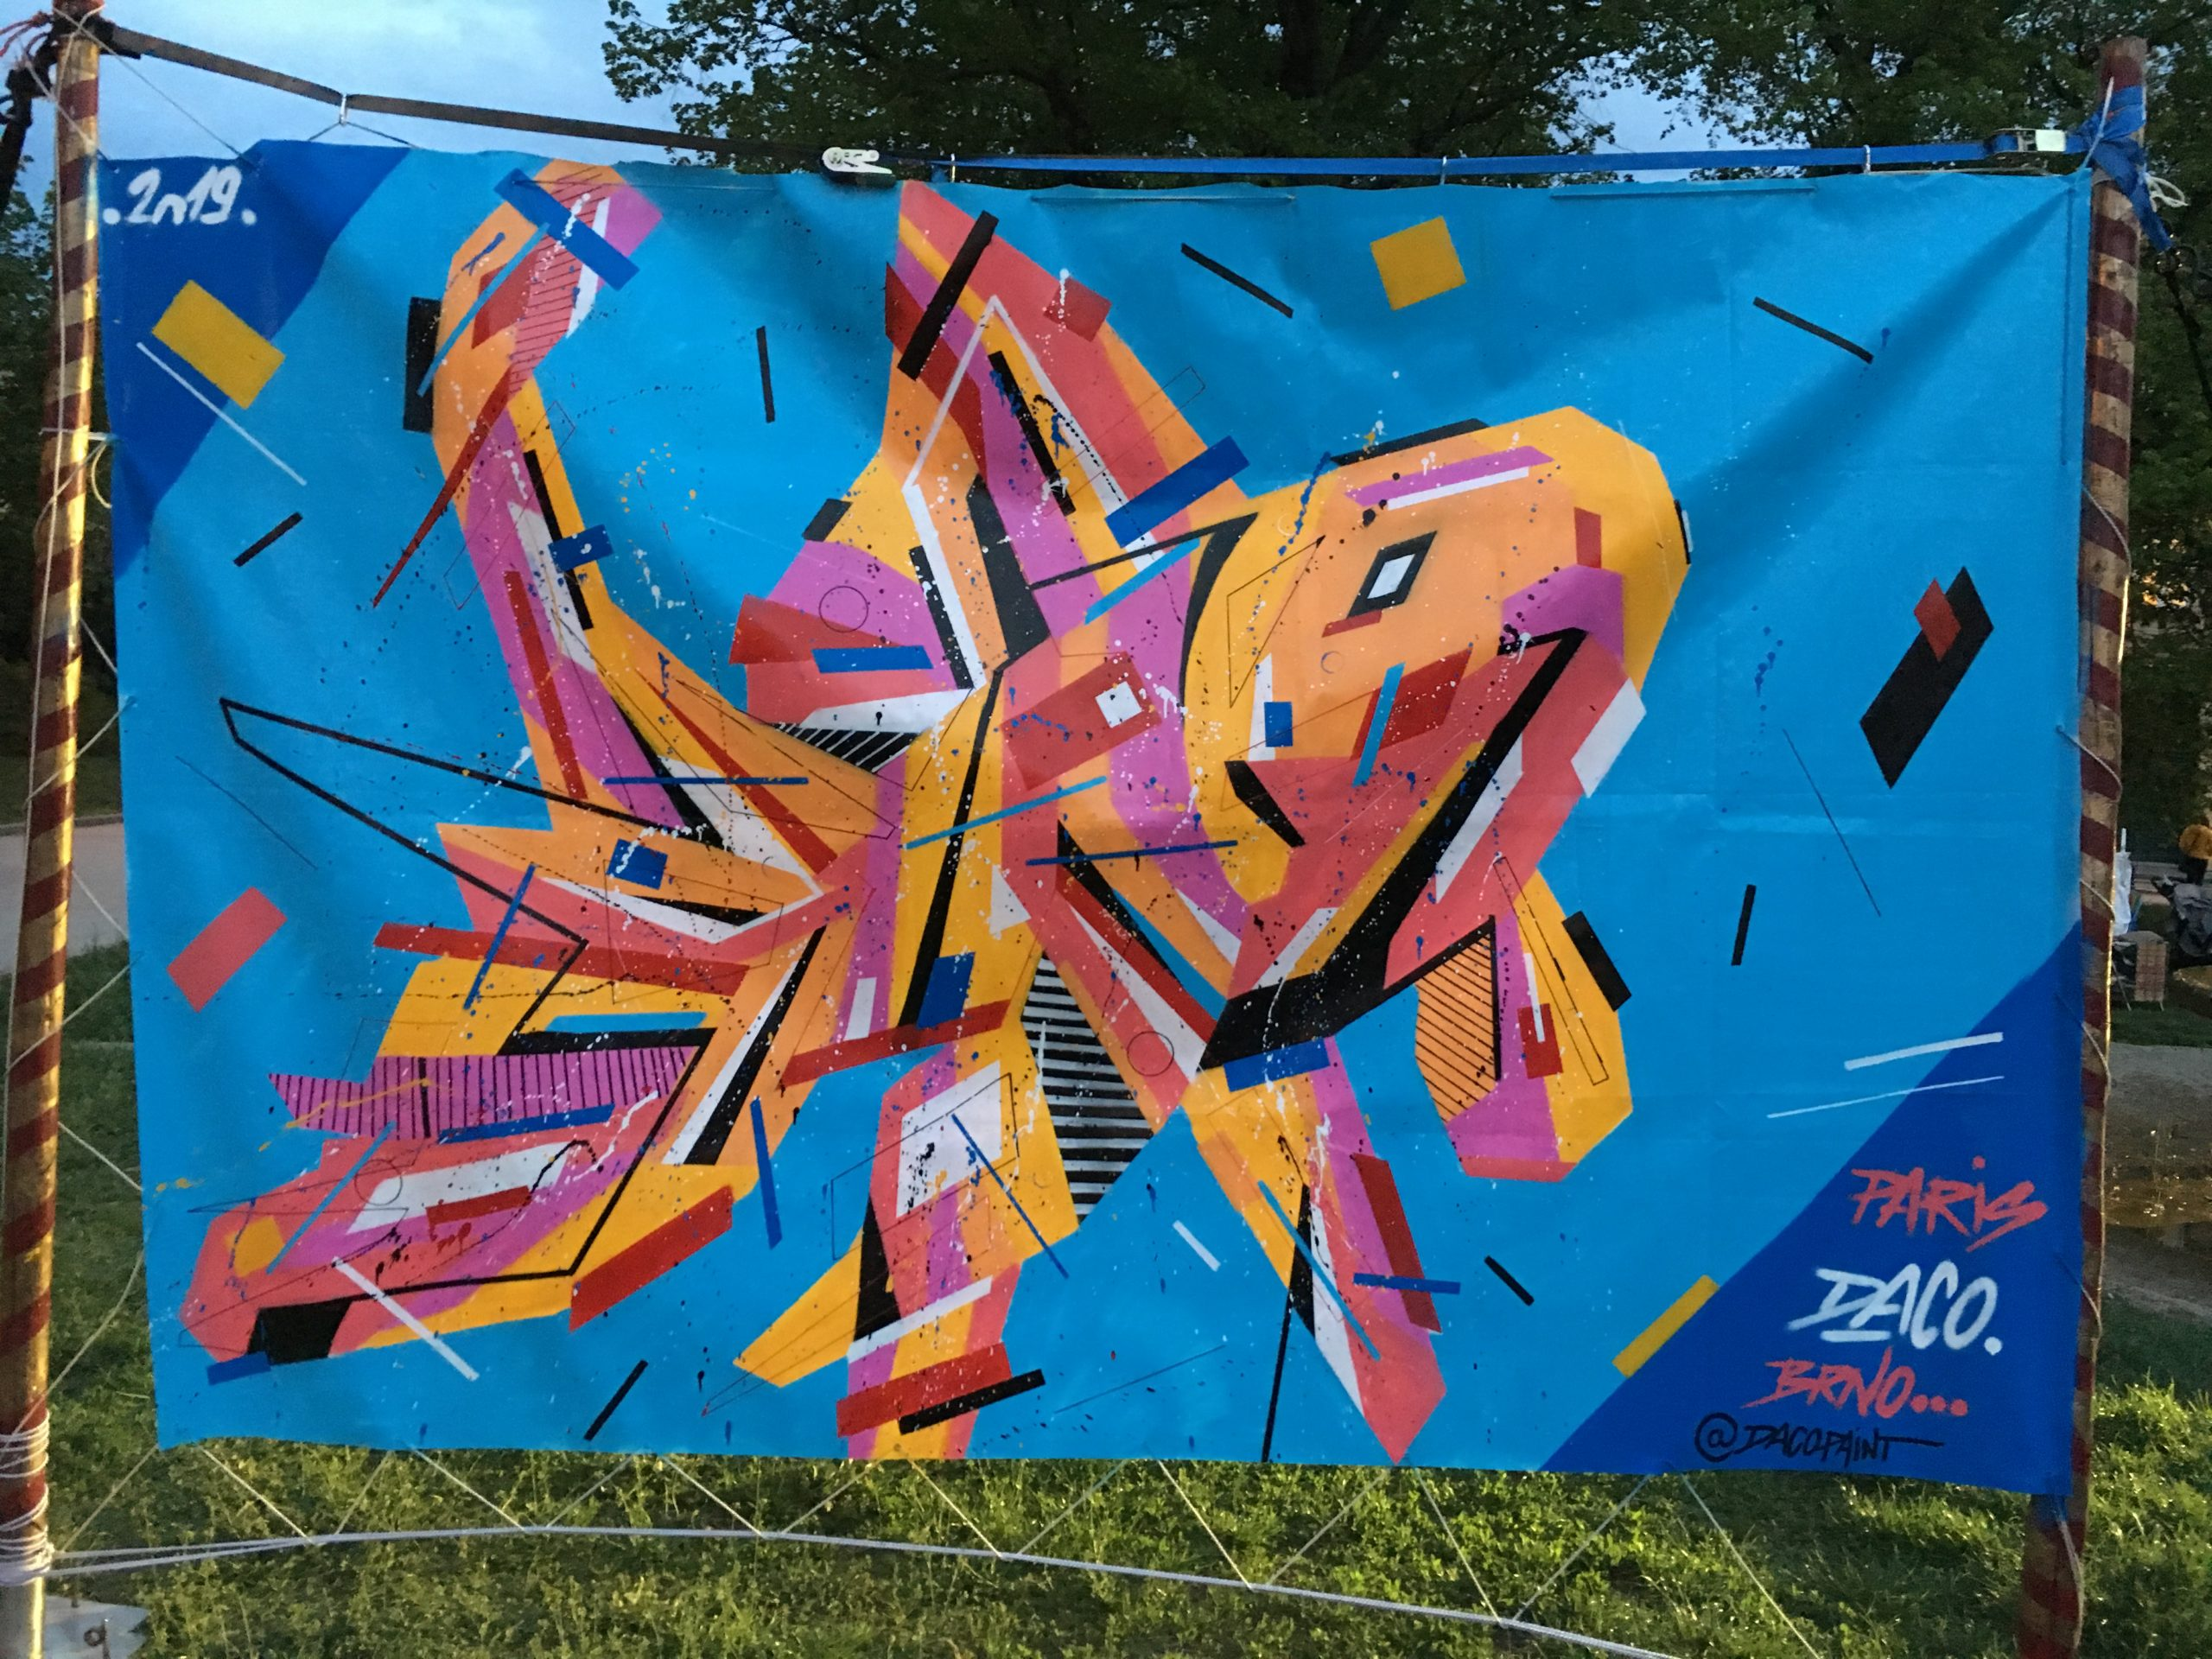 Fresque Graffaune Graffiti poisson réalisée par Daco